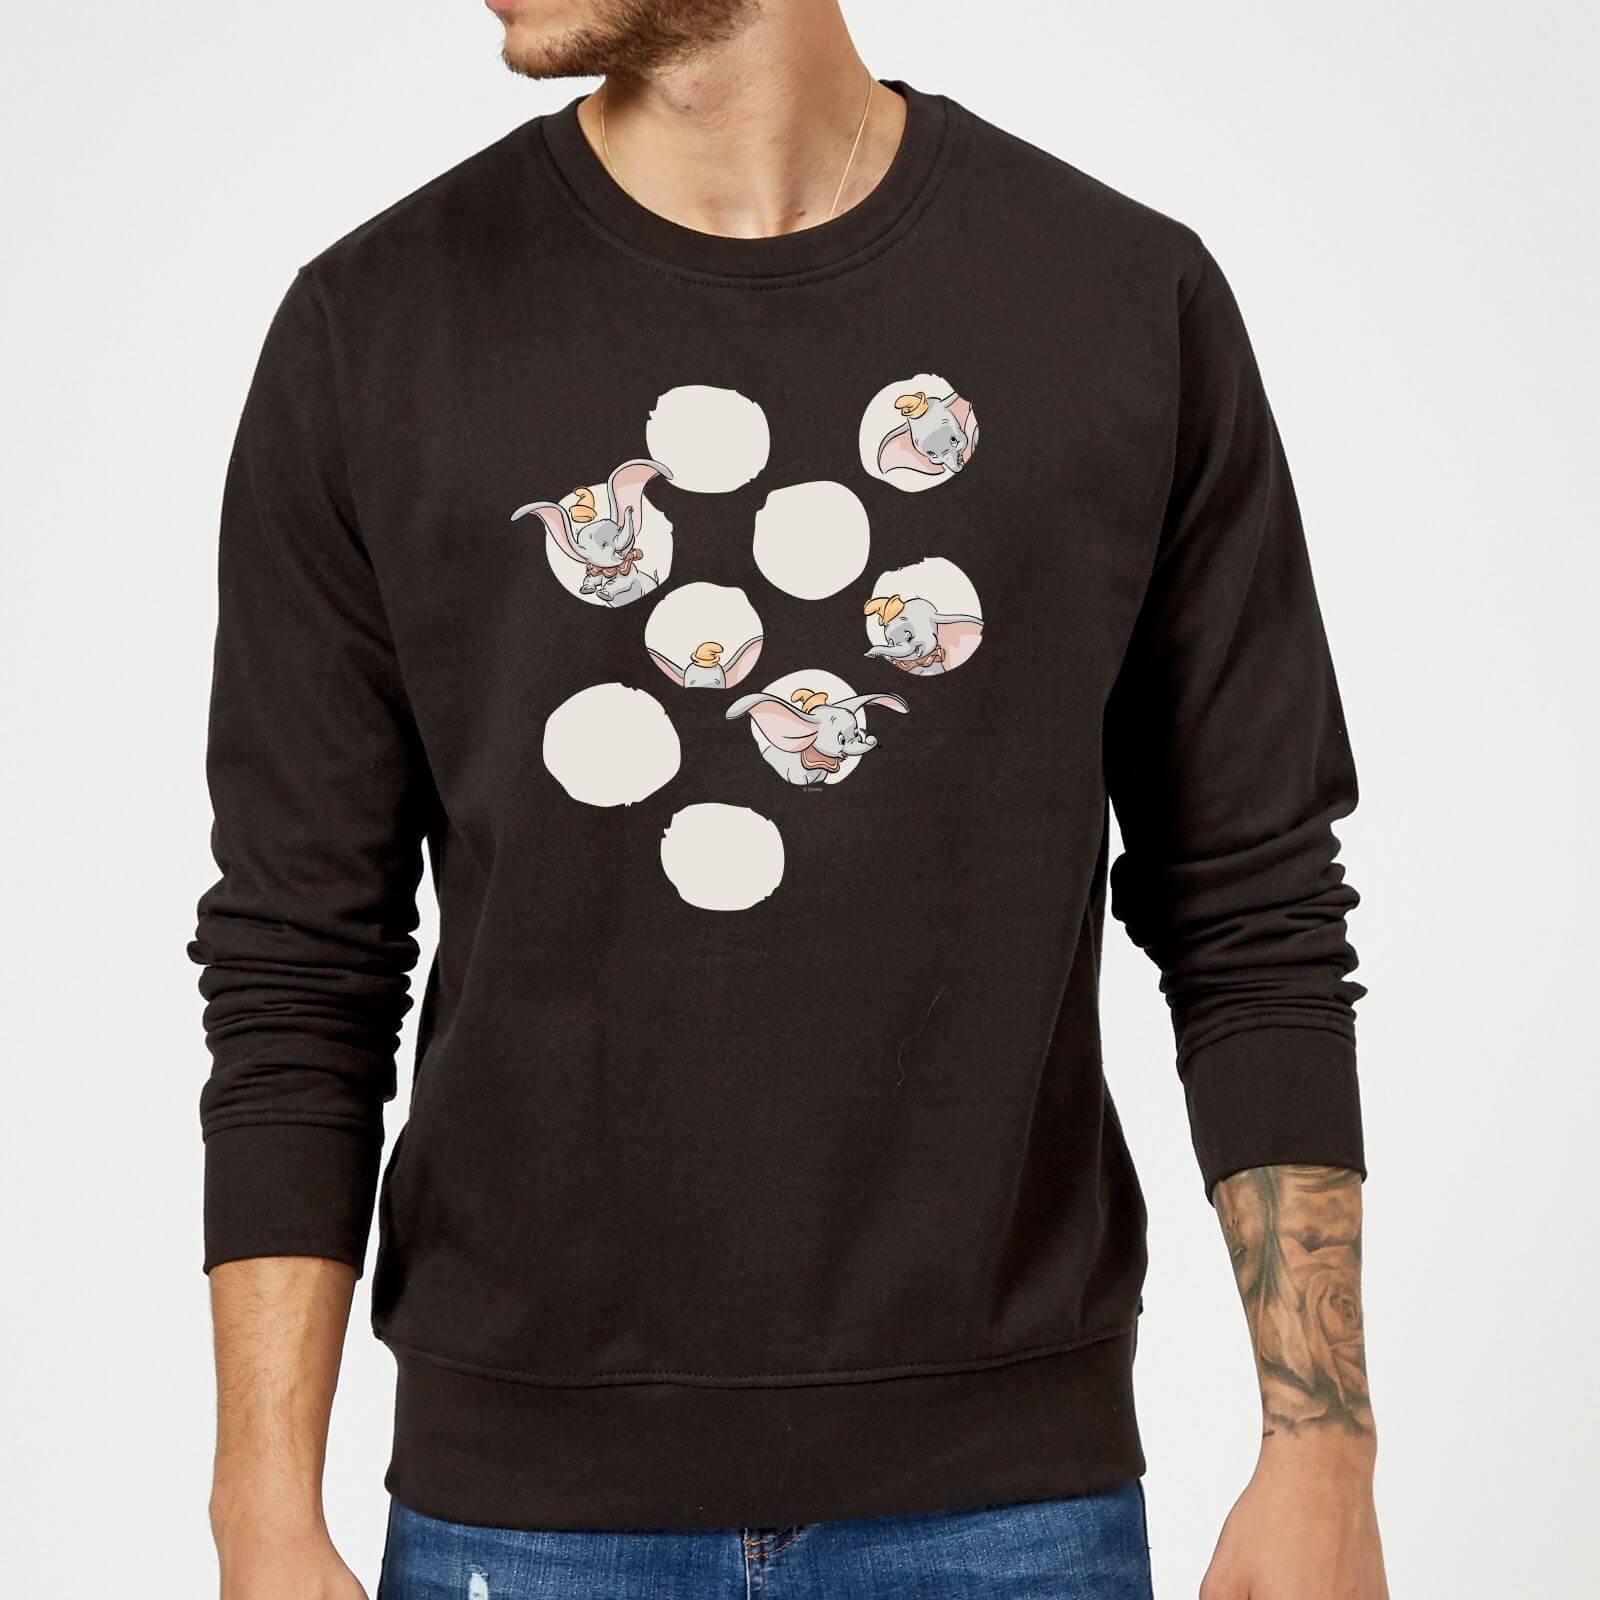 Disney Dumbo Peekaboo Sweatshirt - Black - 5XL - Black